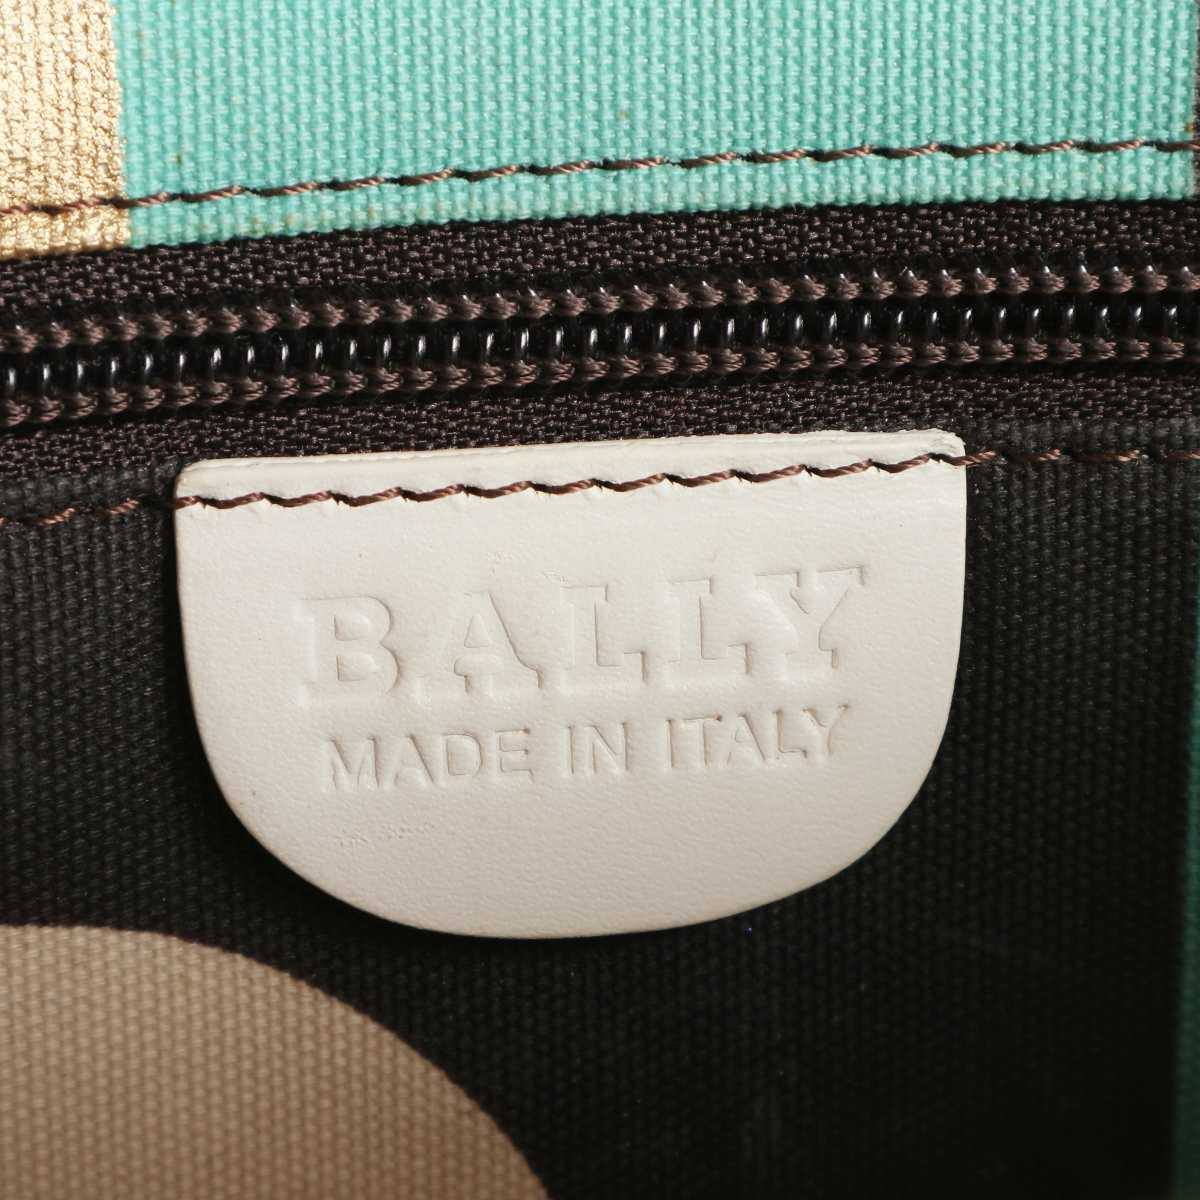 BALLY バリー ヴィンテージ レザー ハンドバッグ ホワイト 0-11659_画像8